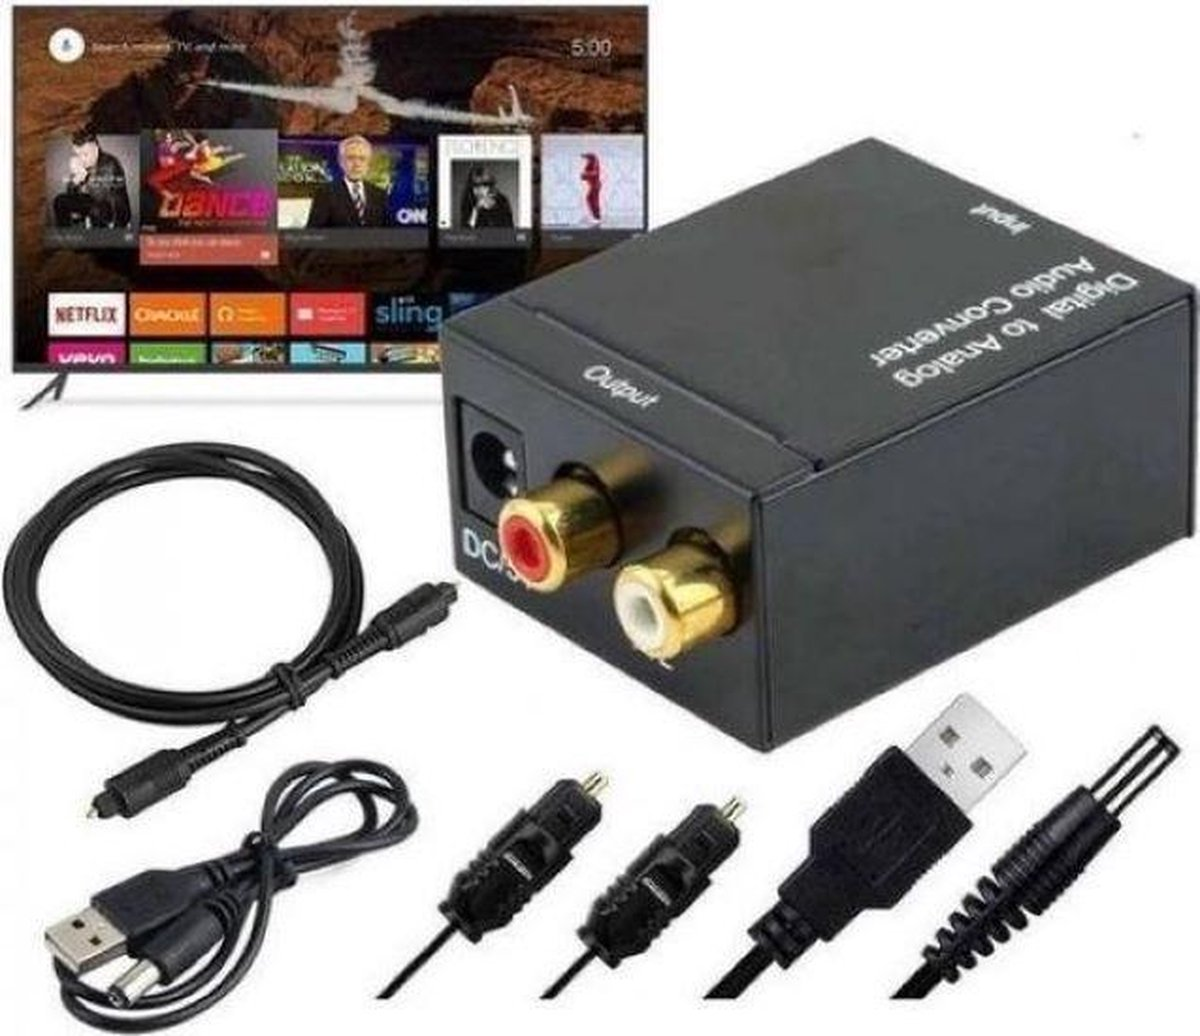 Digital Audio Converter (DAC) inclusief kabels   Digitaal Naar Analoog    Optical USB   Coaxiaal   DAC    Digitaal Toslink naar rood/wit